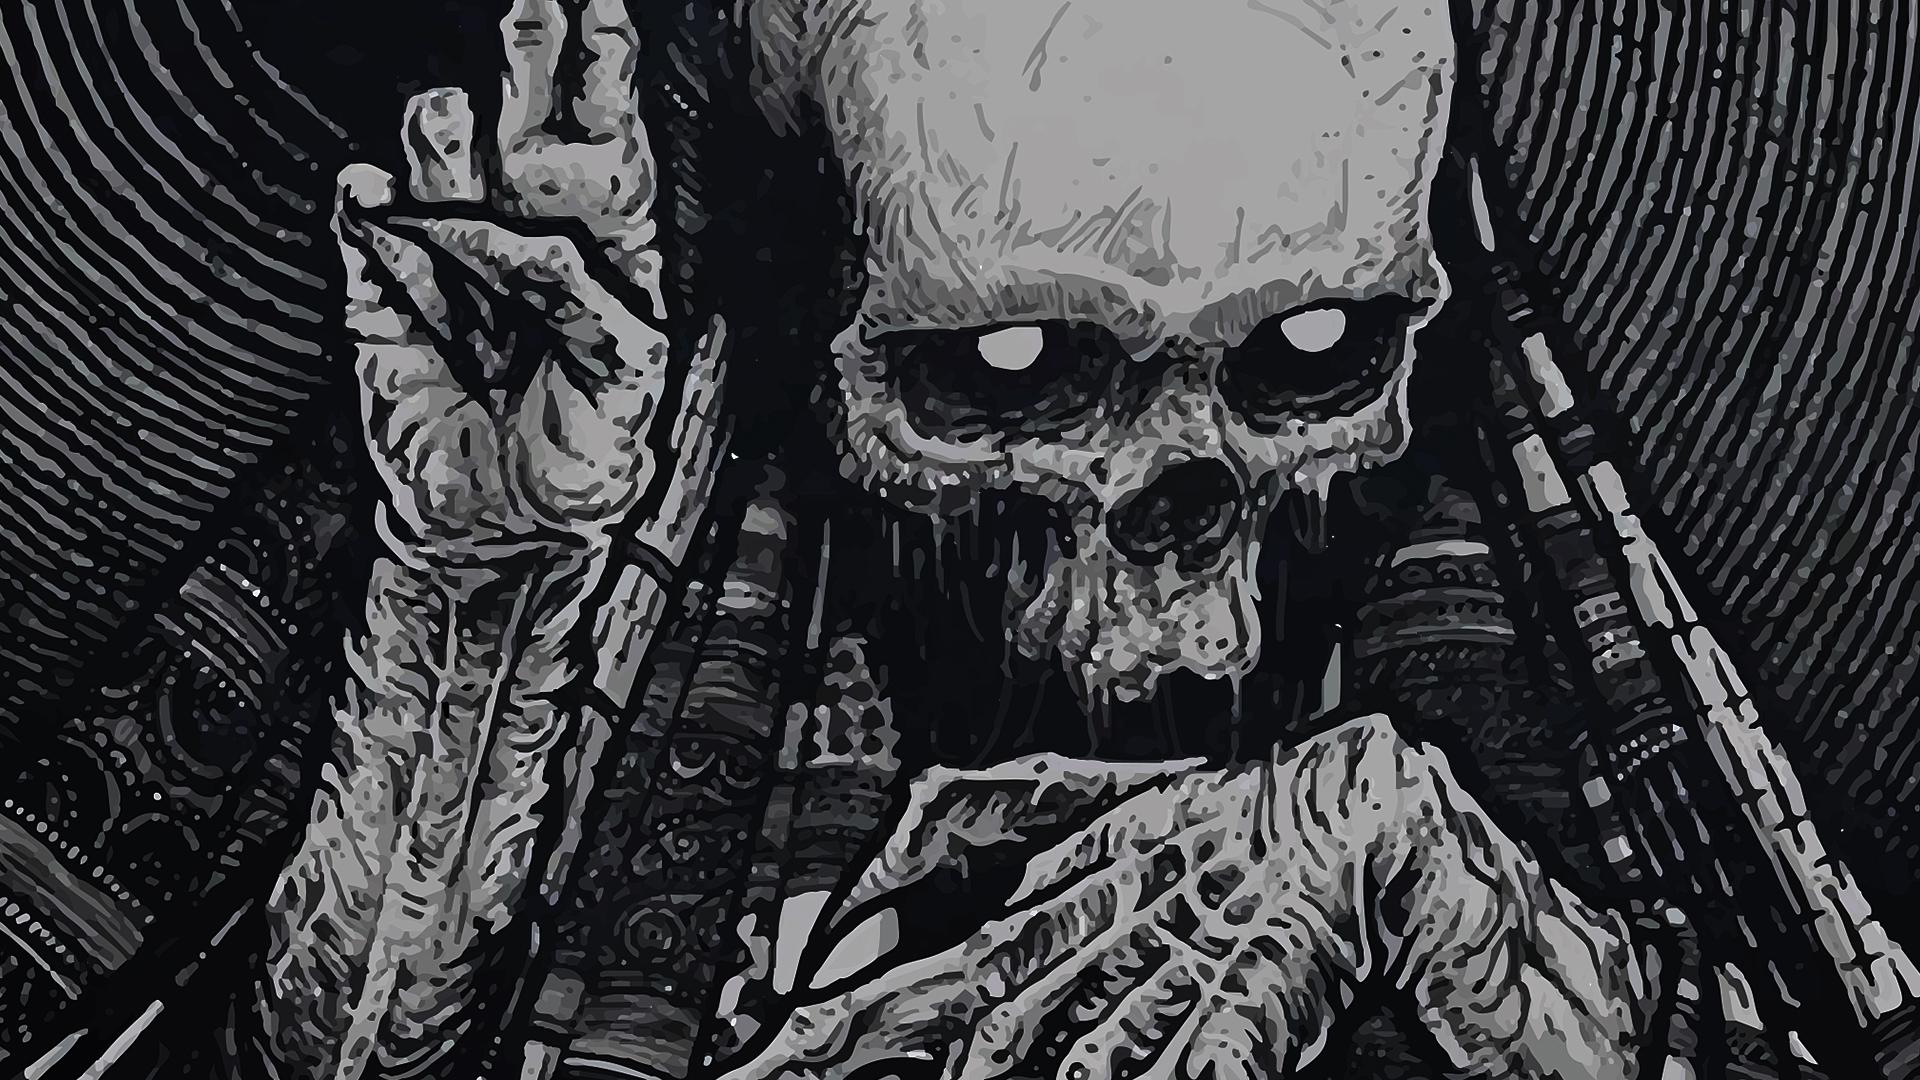 Scary skeleton wallpaper wallpapersafari - Skeleton wallpaper ...